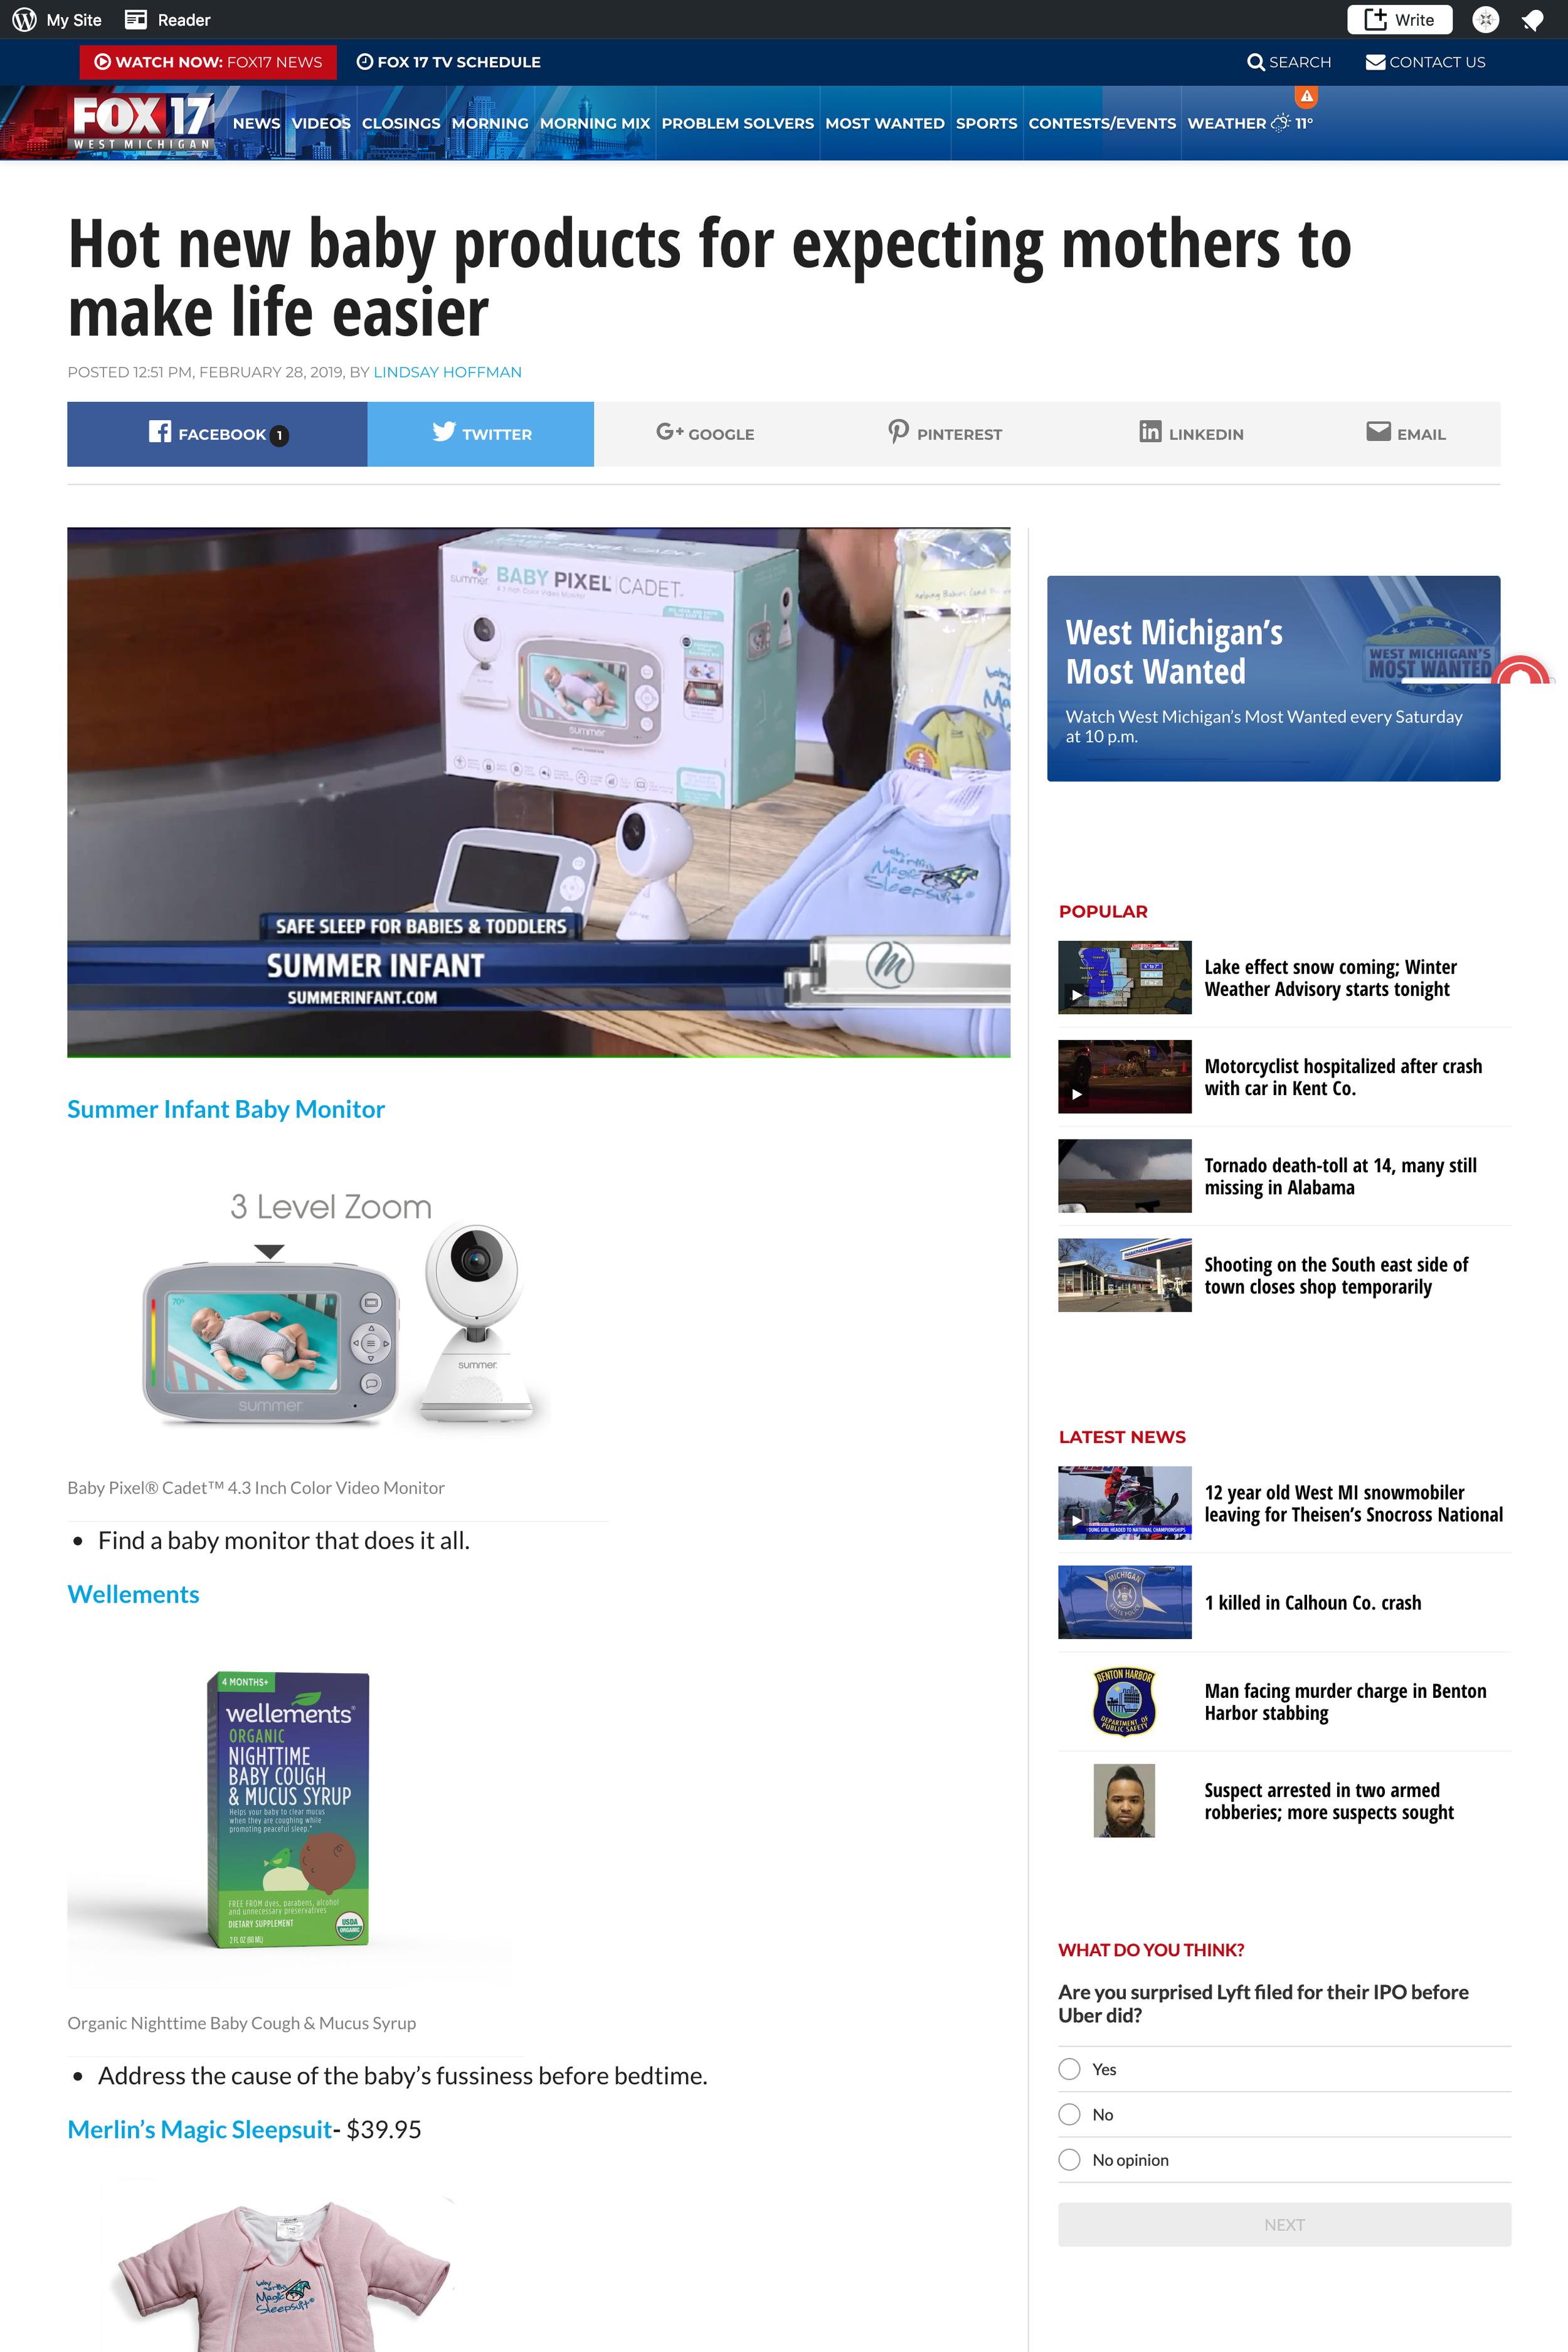 2019.03.01_WXMI-TV (FOX 17) Online, Grand Rapids, MI_Summer Baby Pixel Cadet Monitor_cropped 2x3.png